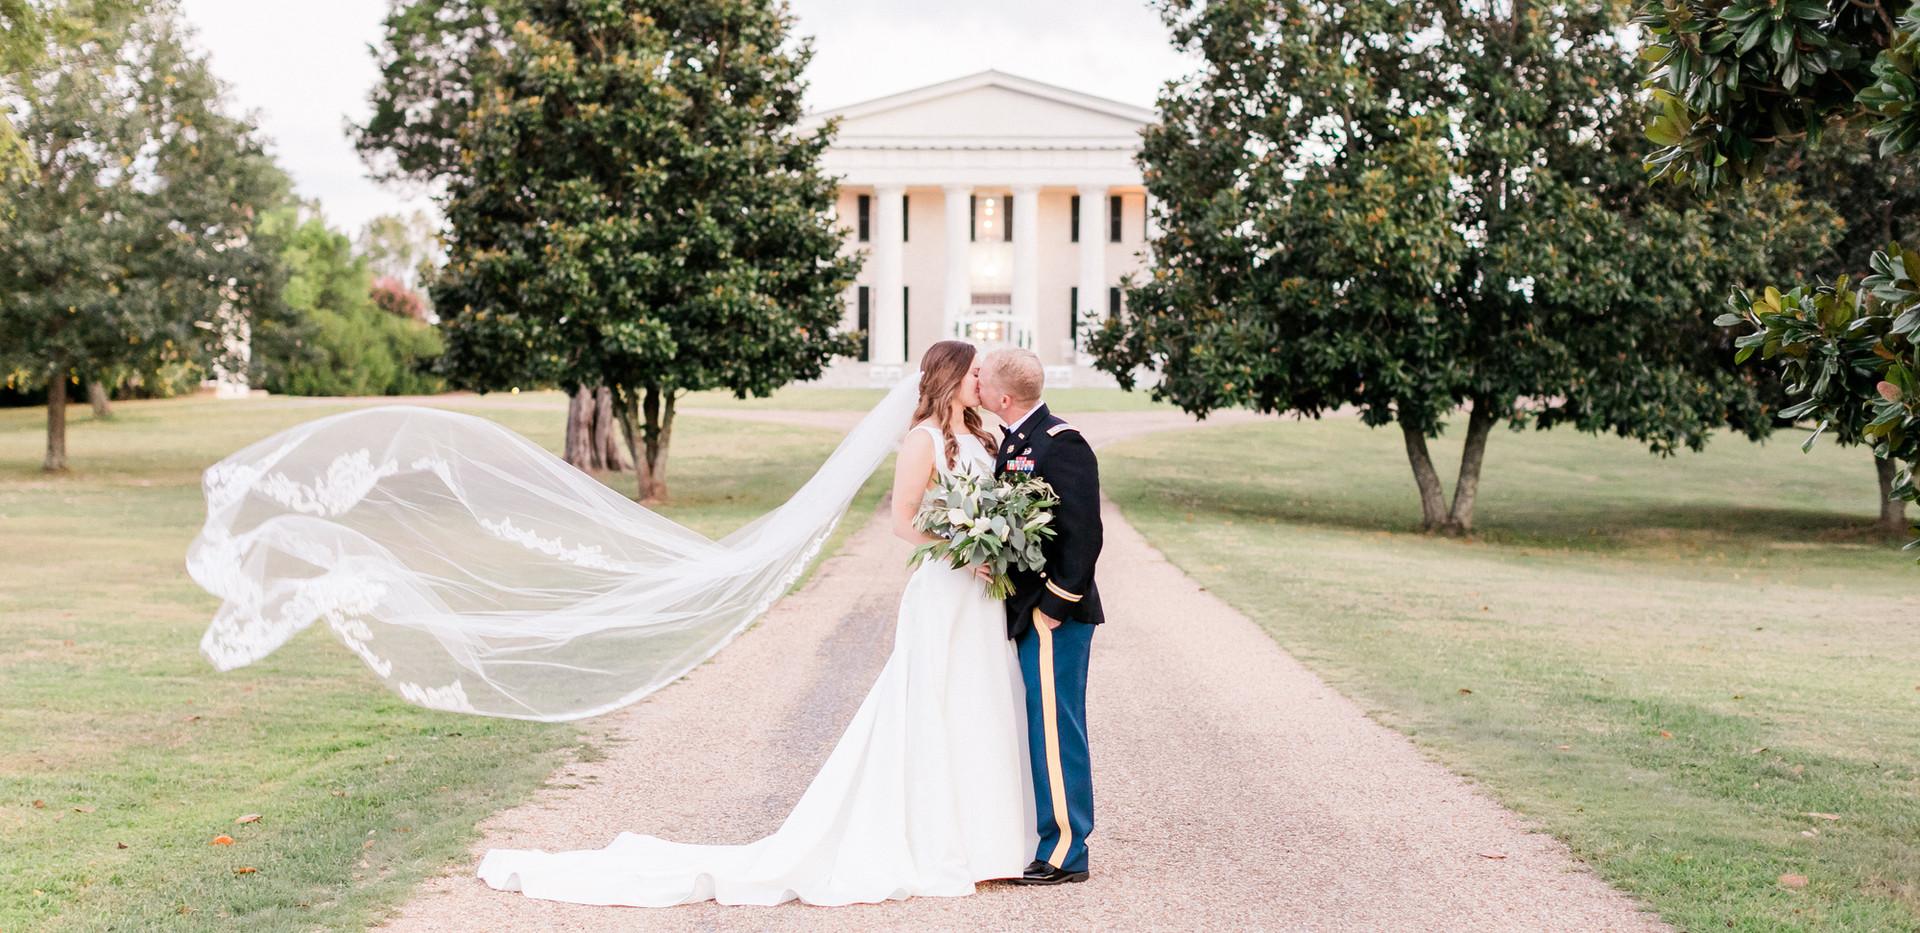 McKenzie and Taylor Wedding 2019-570.jpg